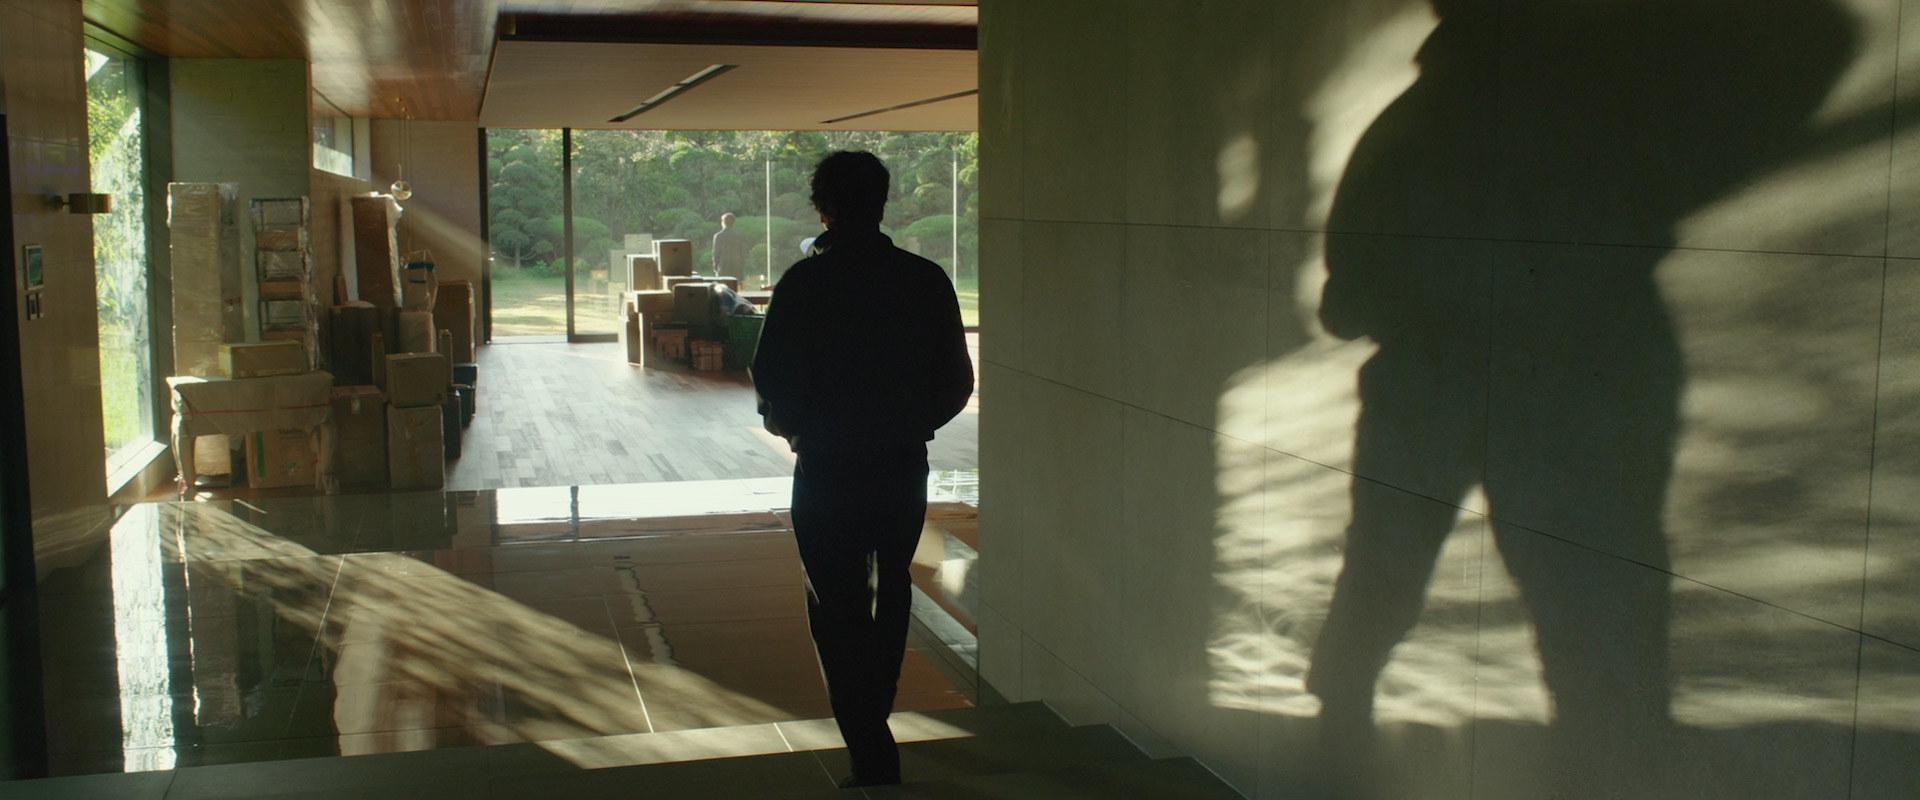 Ki Taek stands in the house looking out at Ki Woo